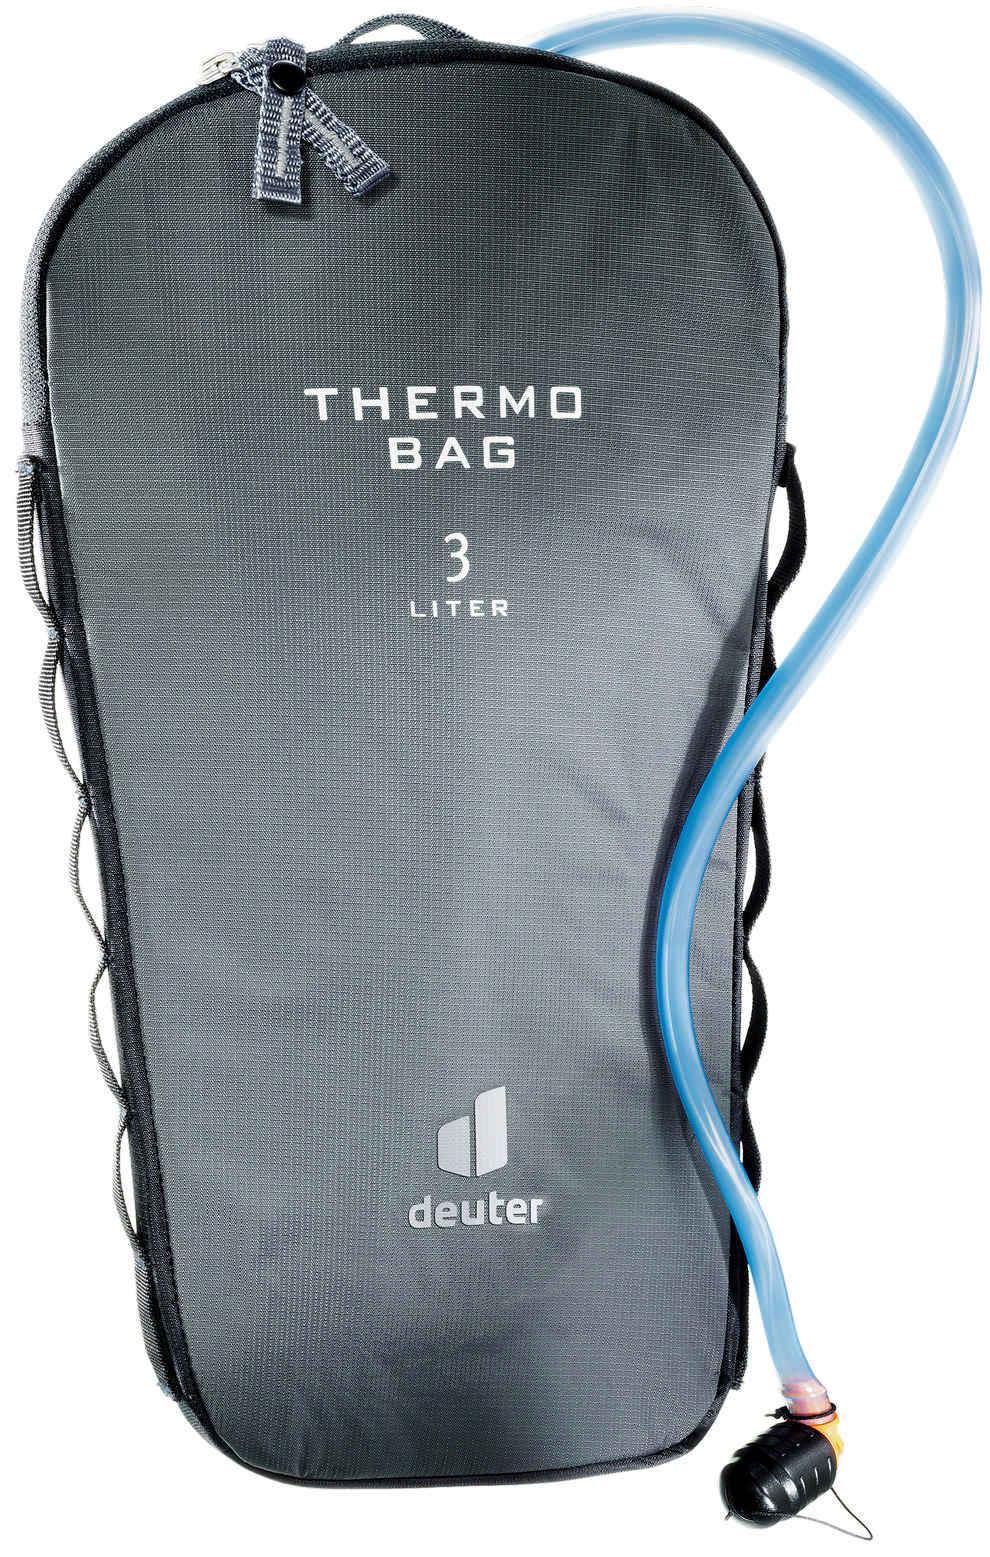 Питьевые системы Термочехол для стримера Deuter Streamer Thermo Bag 3L (2021) 3960621-4000-StreamerThermobag3L-15-d0.jpg